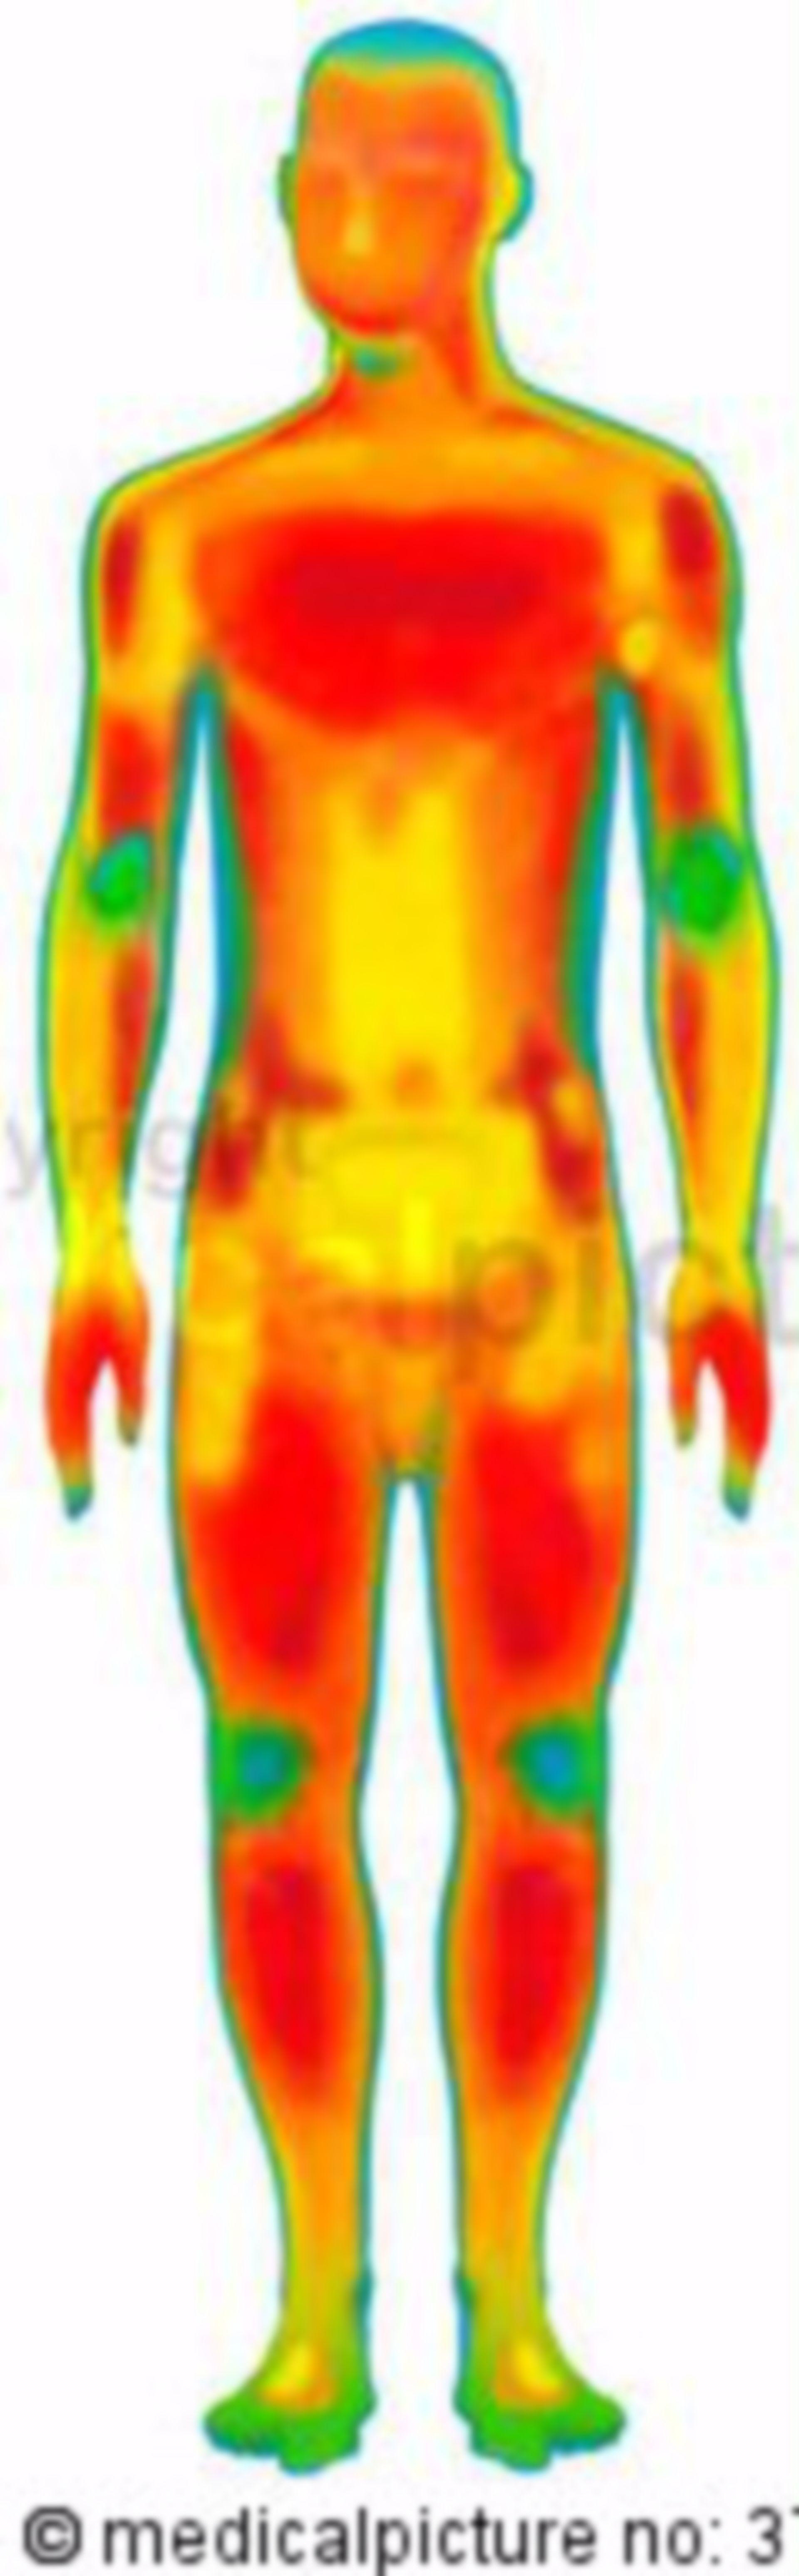 Nackter Mann mit Temperaturzonen, naked man with different temperature